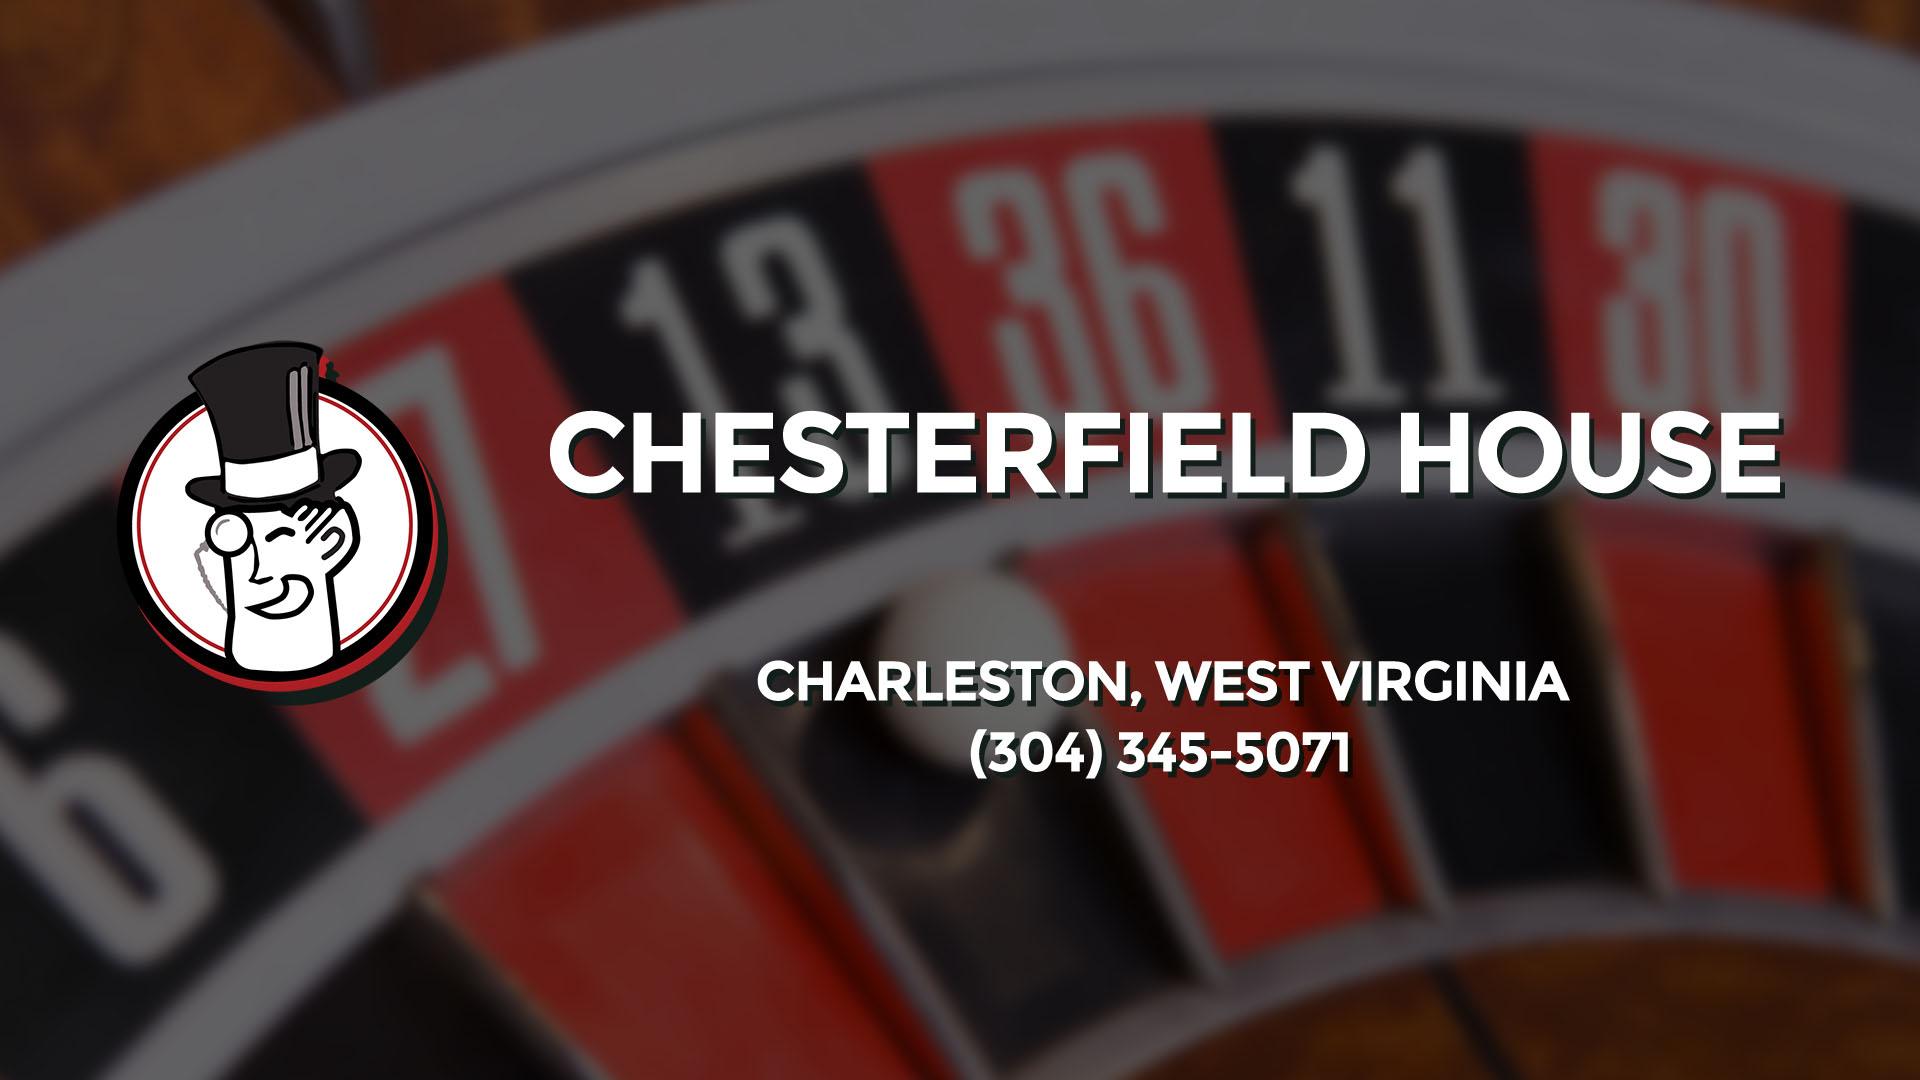 Casino in chesterfield hotels near conn. casinos